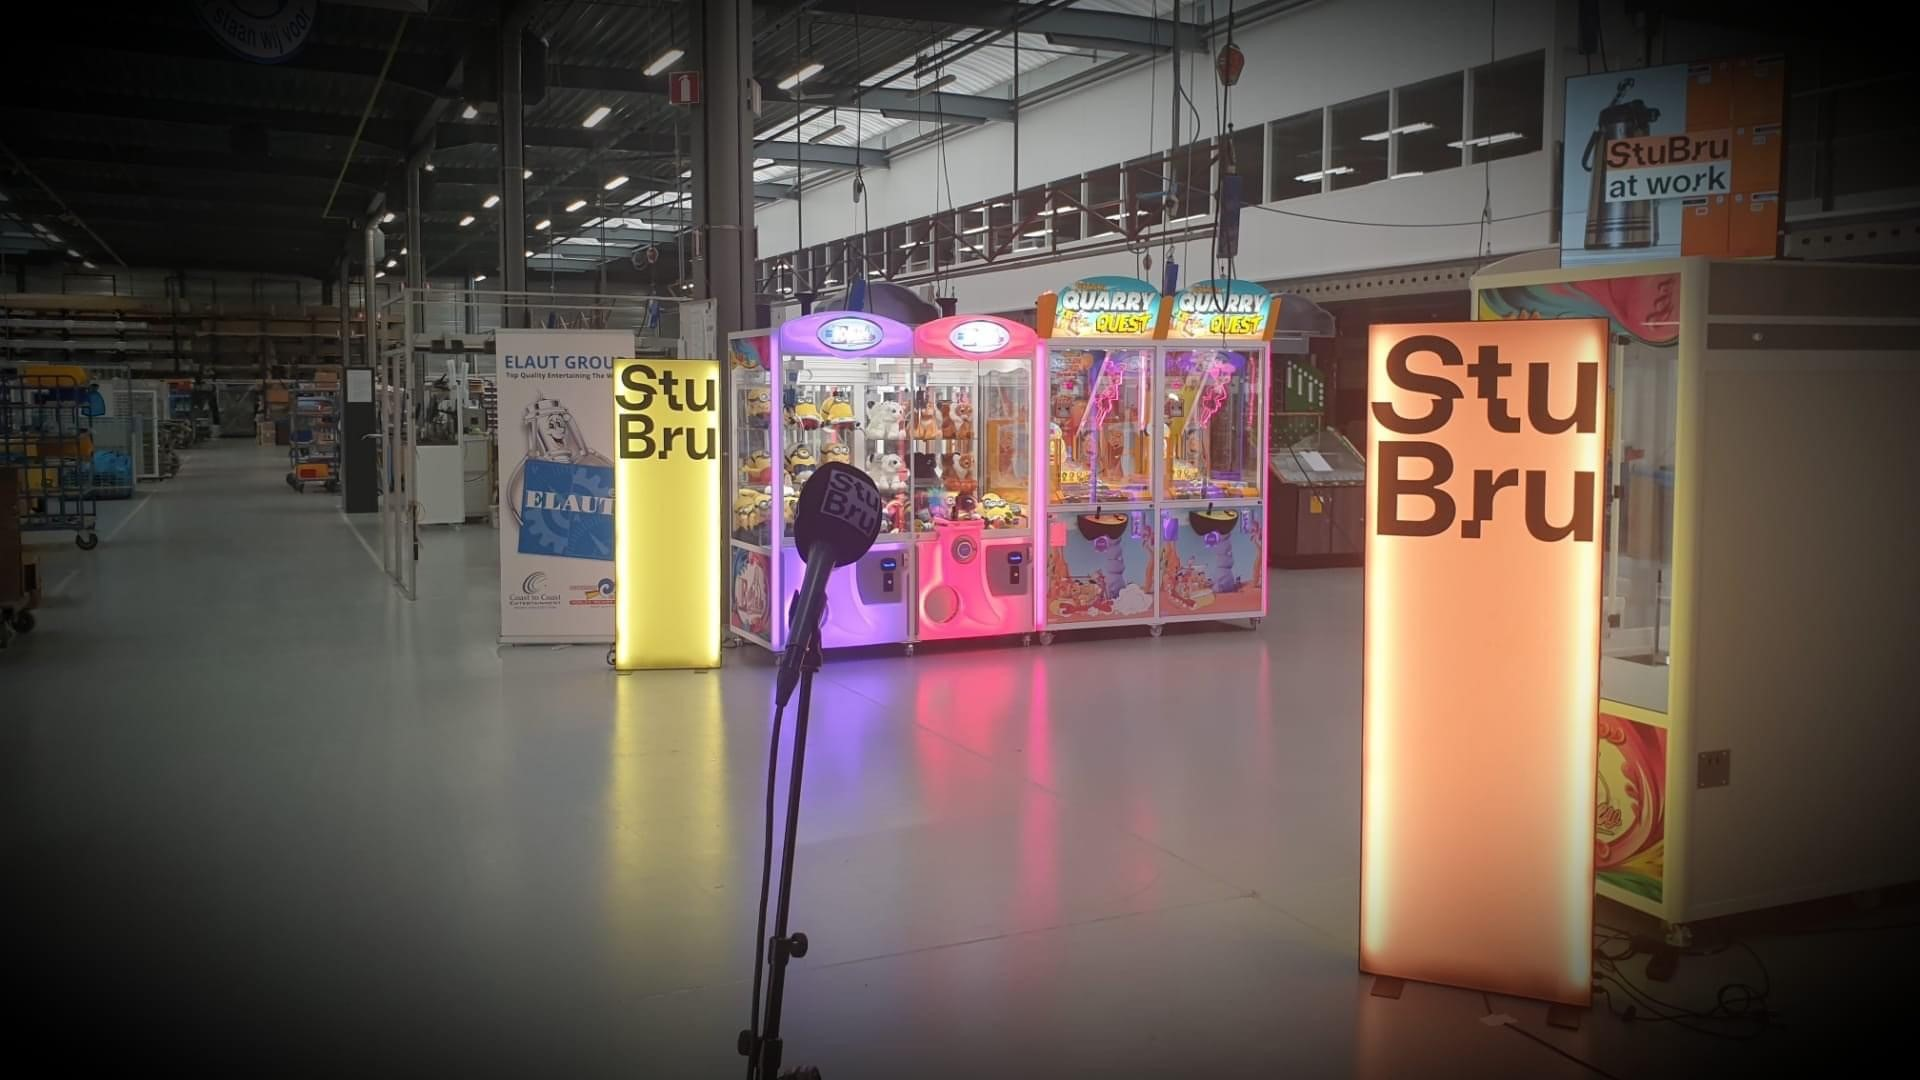 Studio Brussel / StuBru at work visits Elaut